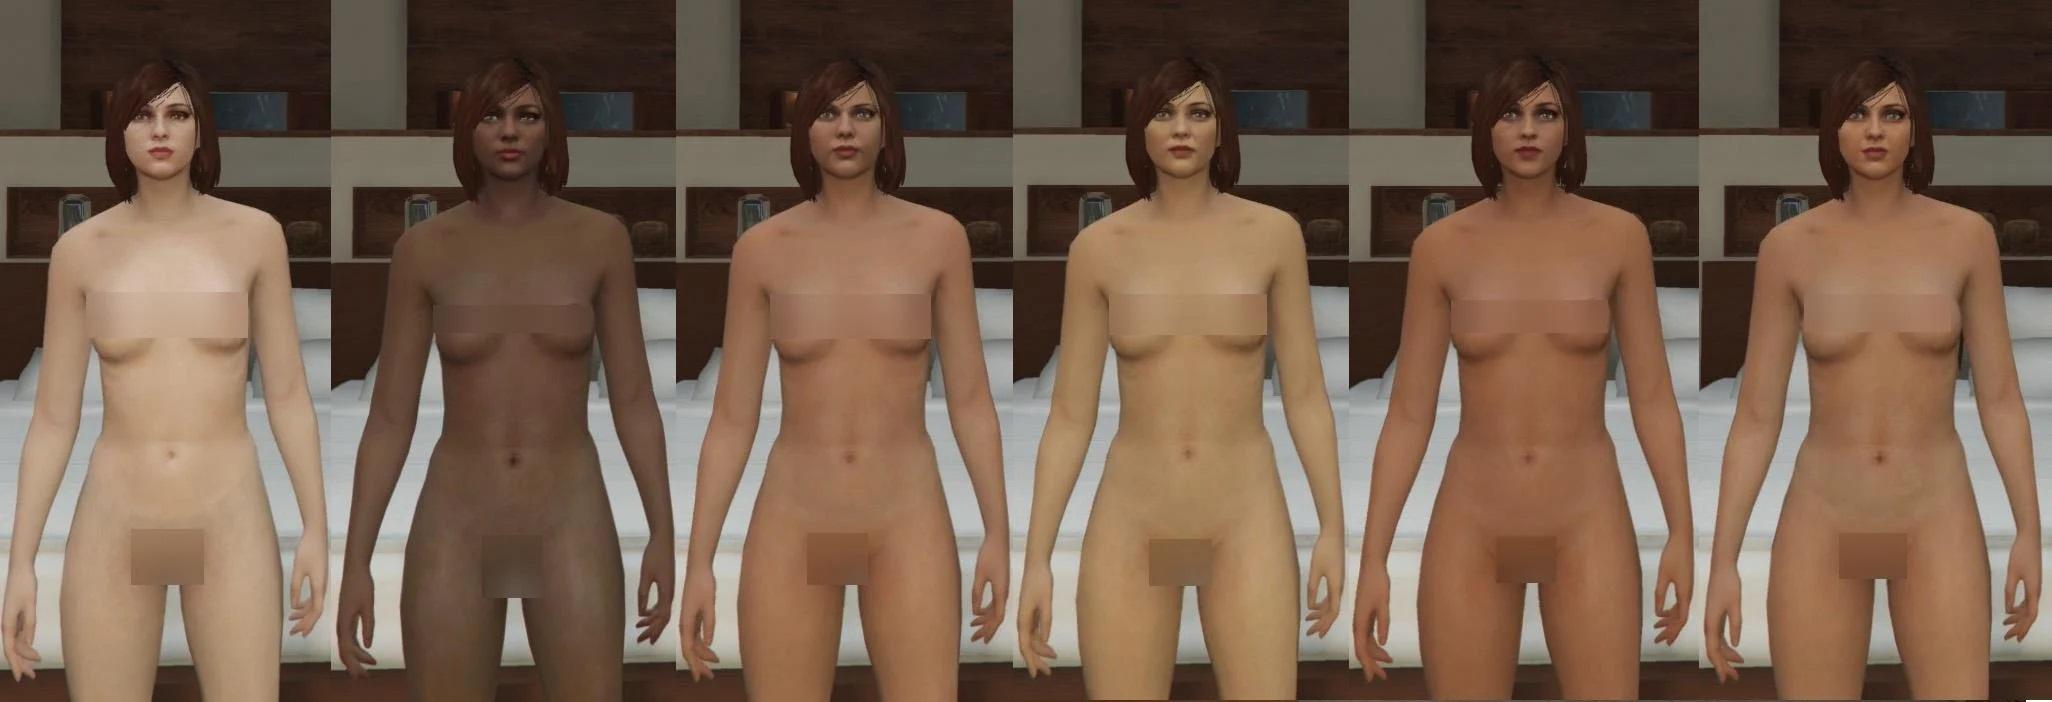 Gta 5 Naked